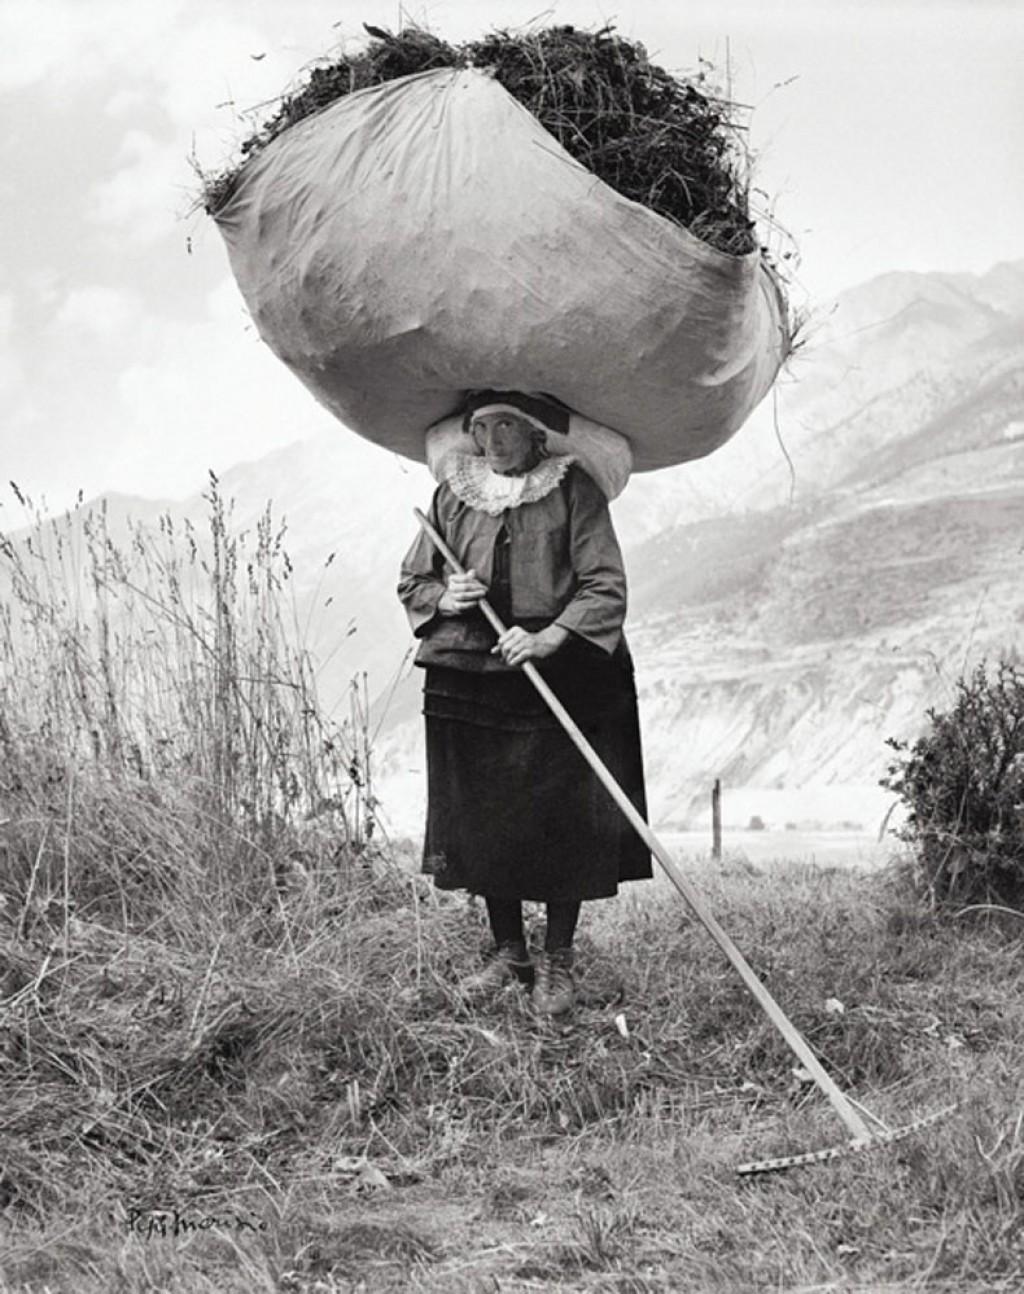 woman-carrying-hay-on-her-head-Pepi-Merisio-1024x1294